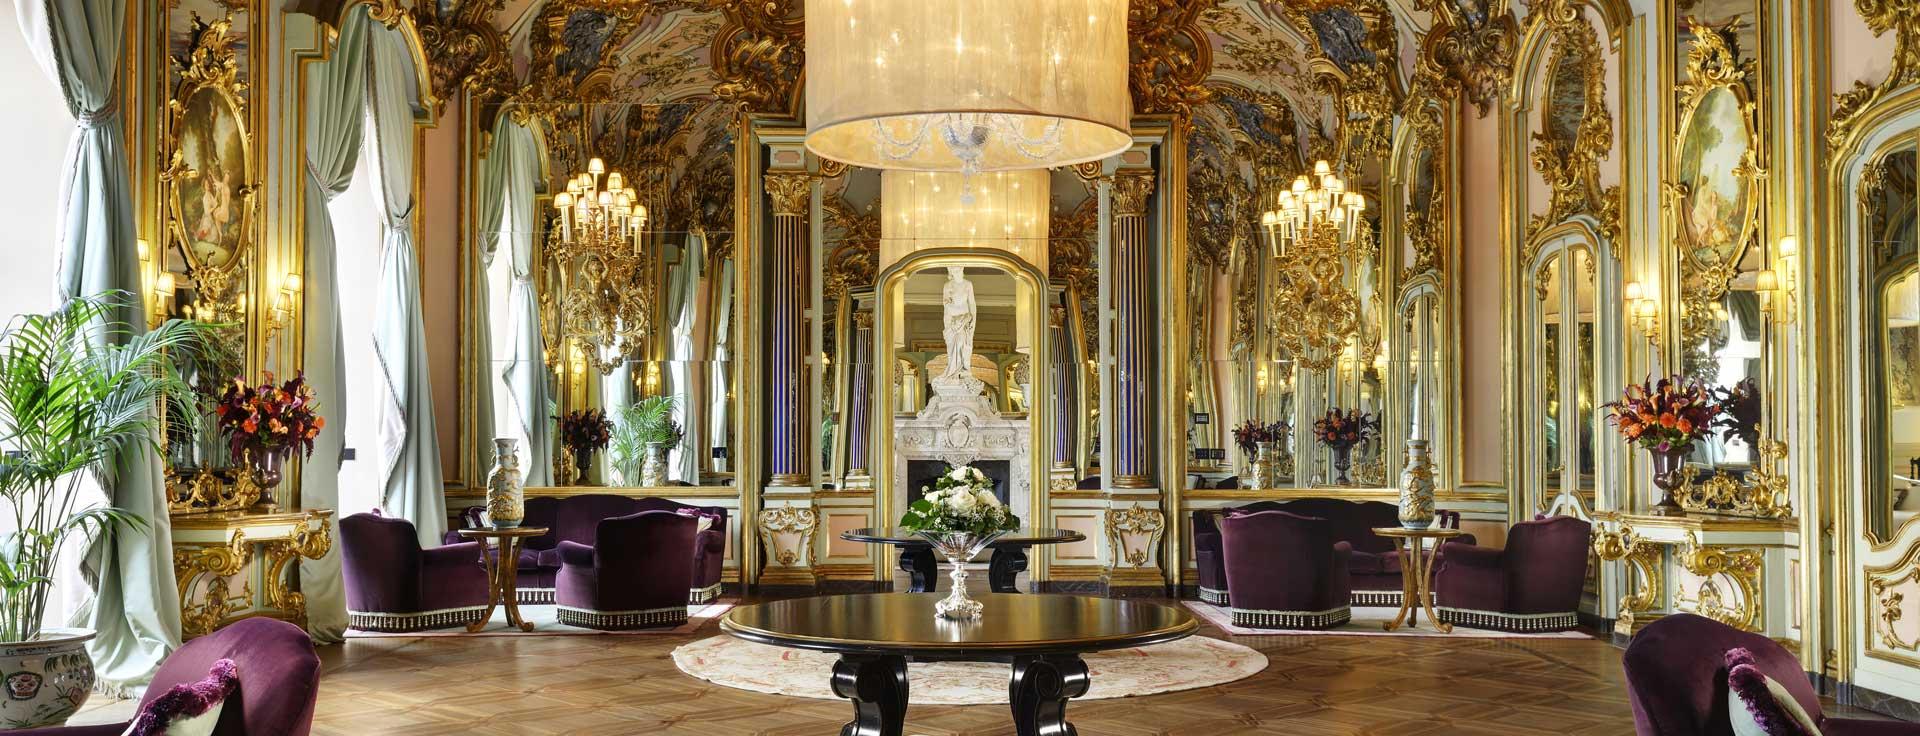 Cool villa cora firenze with cora telephone - Cuisine schmidt dorlisheim ...